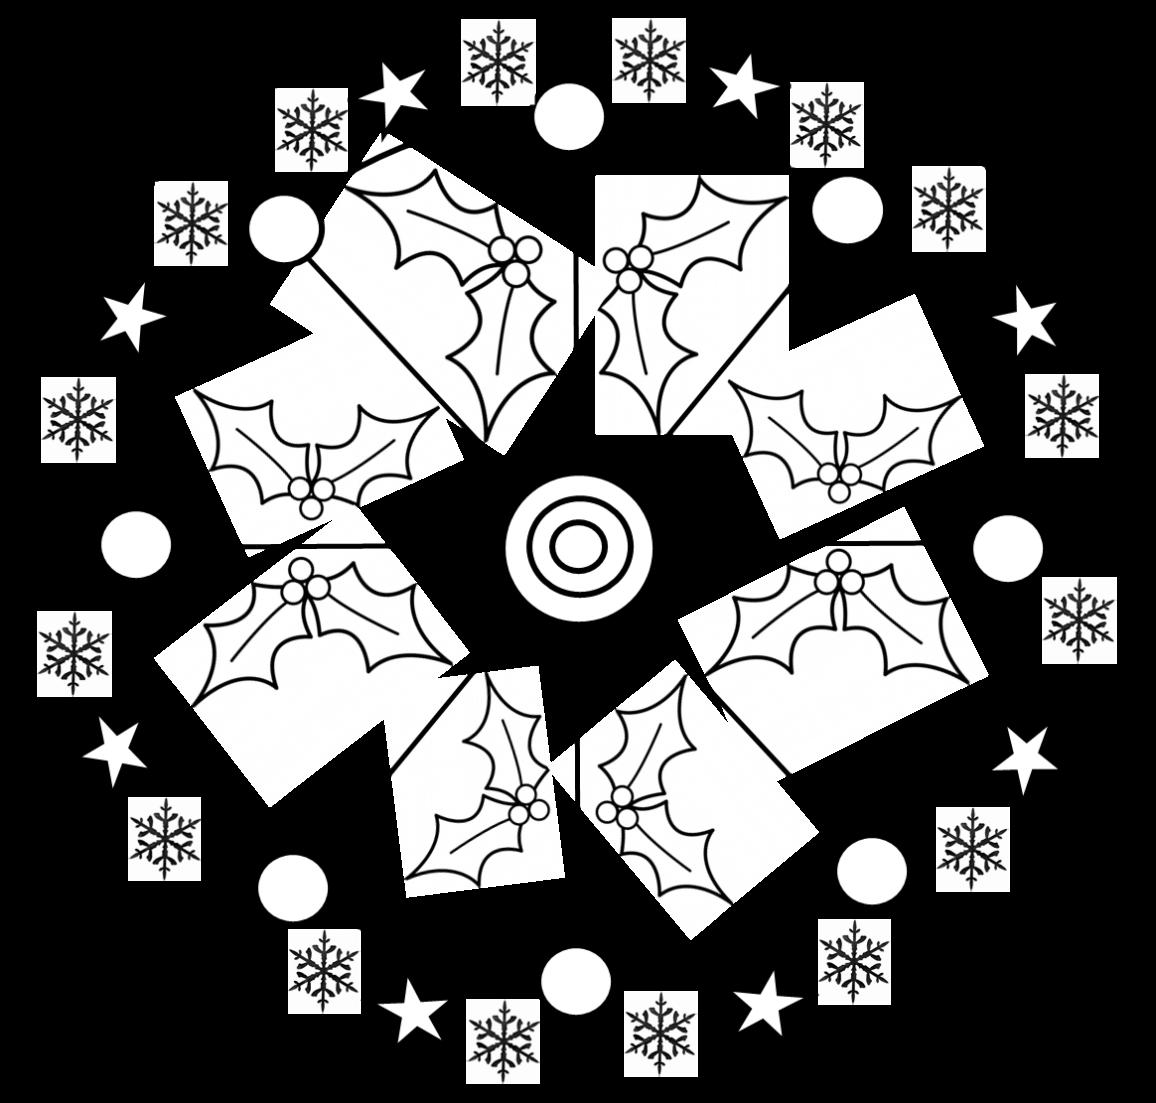 Coloriages Mandalas De Noël Recreatisse